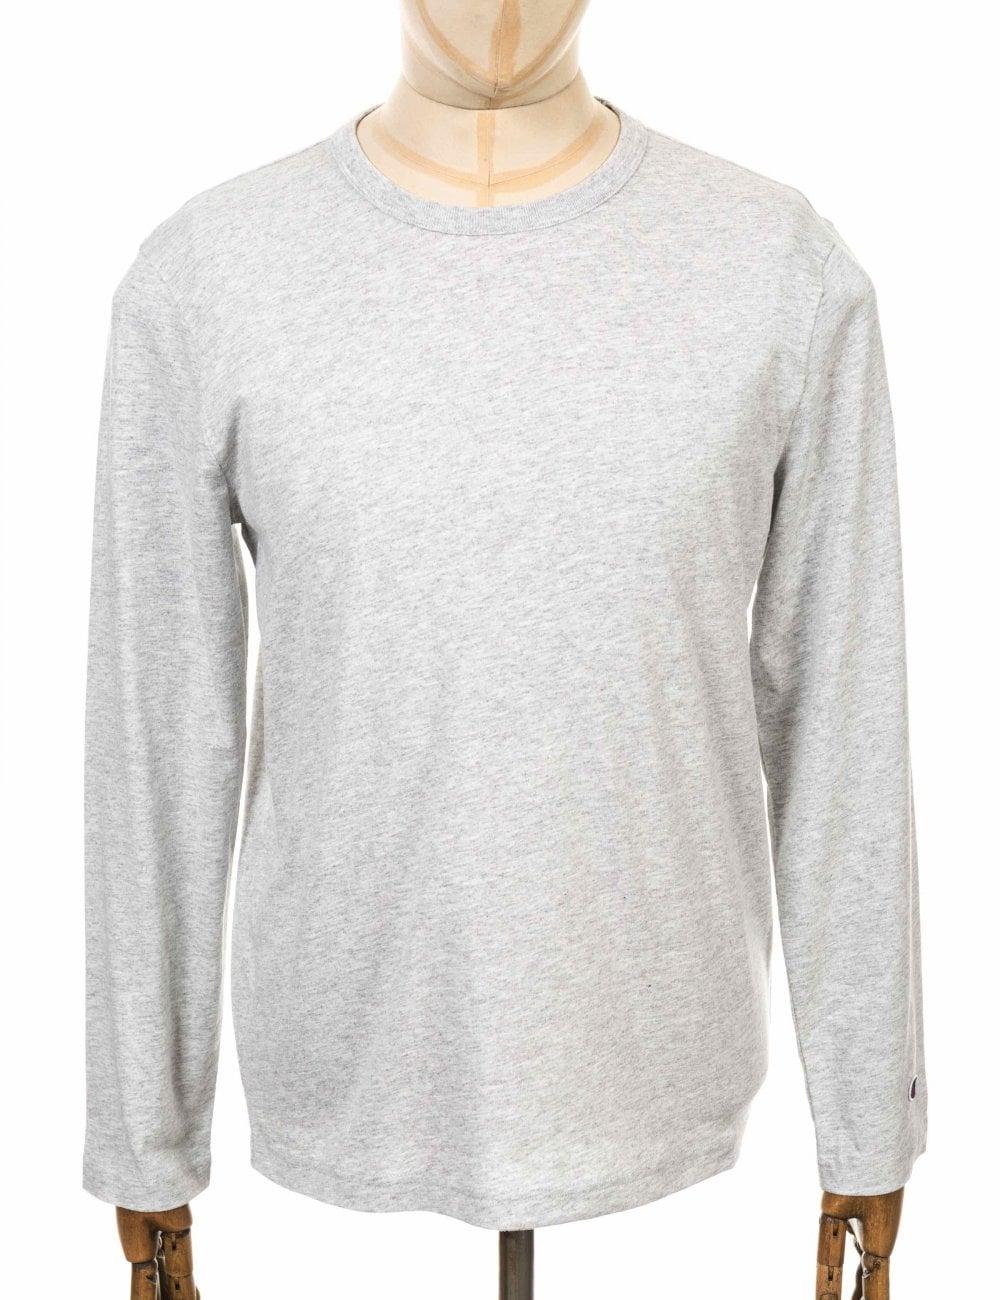 97e95a1a2bf Champion Reverse Weave T Shirt Uk